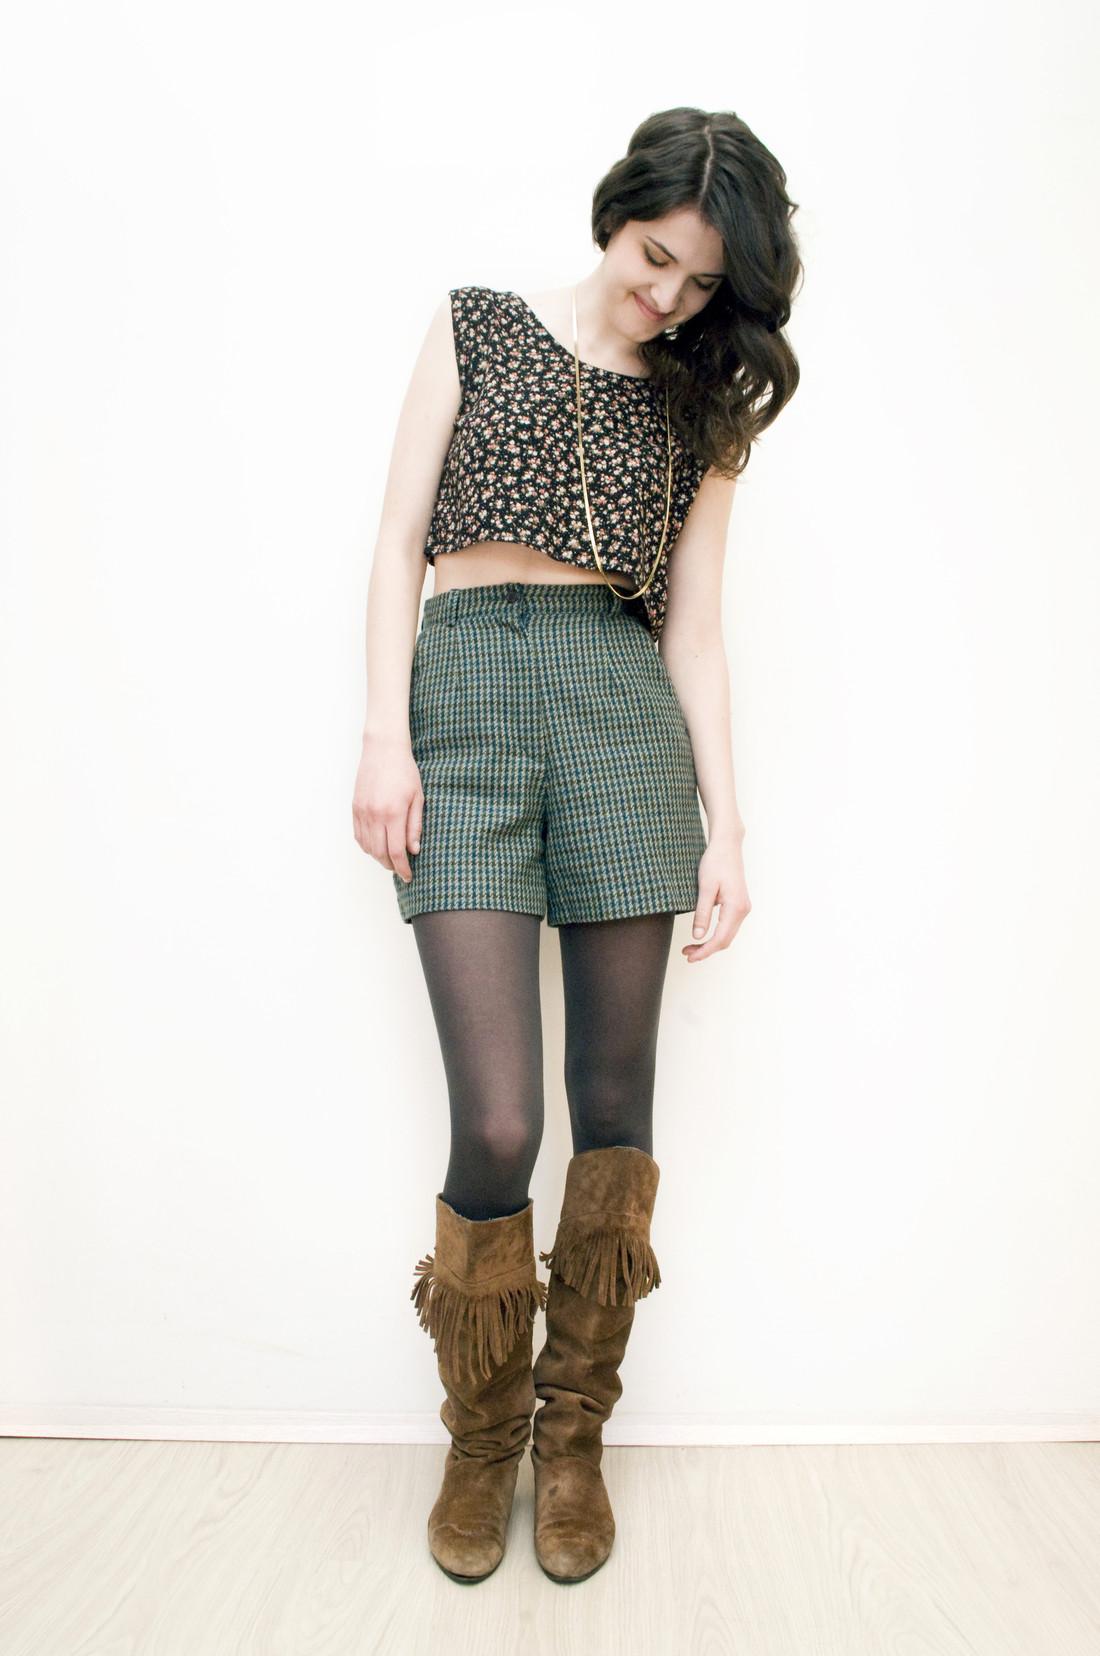 Green shorts - Pop Sick Vintage